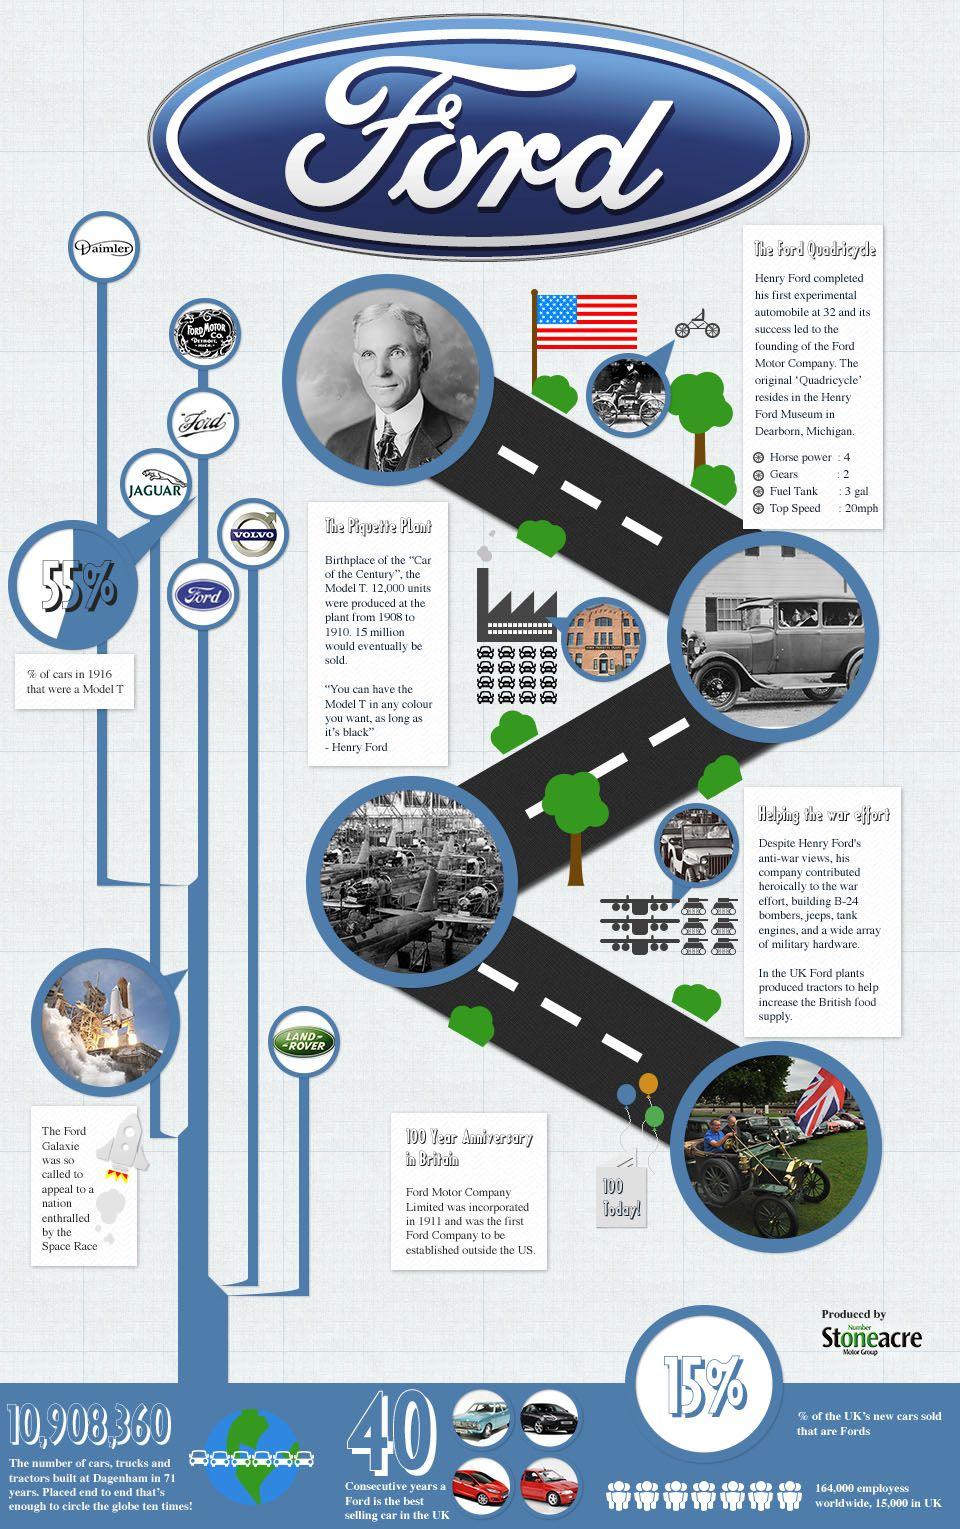 Kartinki Po Zaprosu About Company Infographics Shablony Sertifikatov Portfolio Dizajn